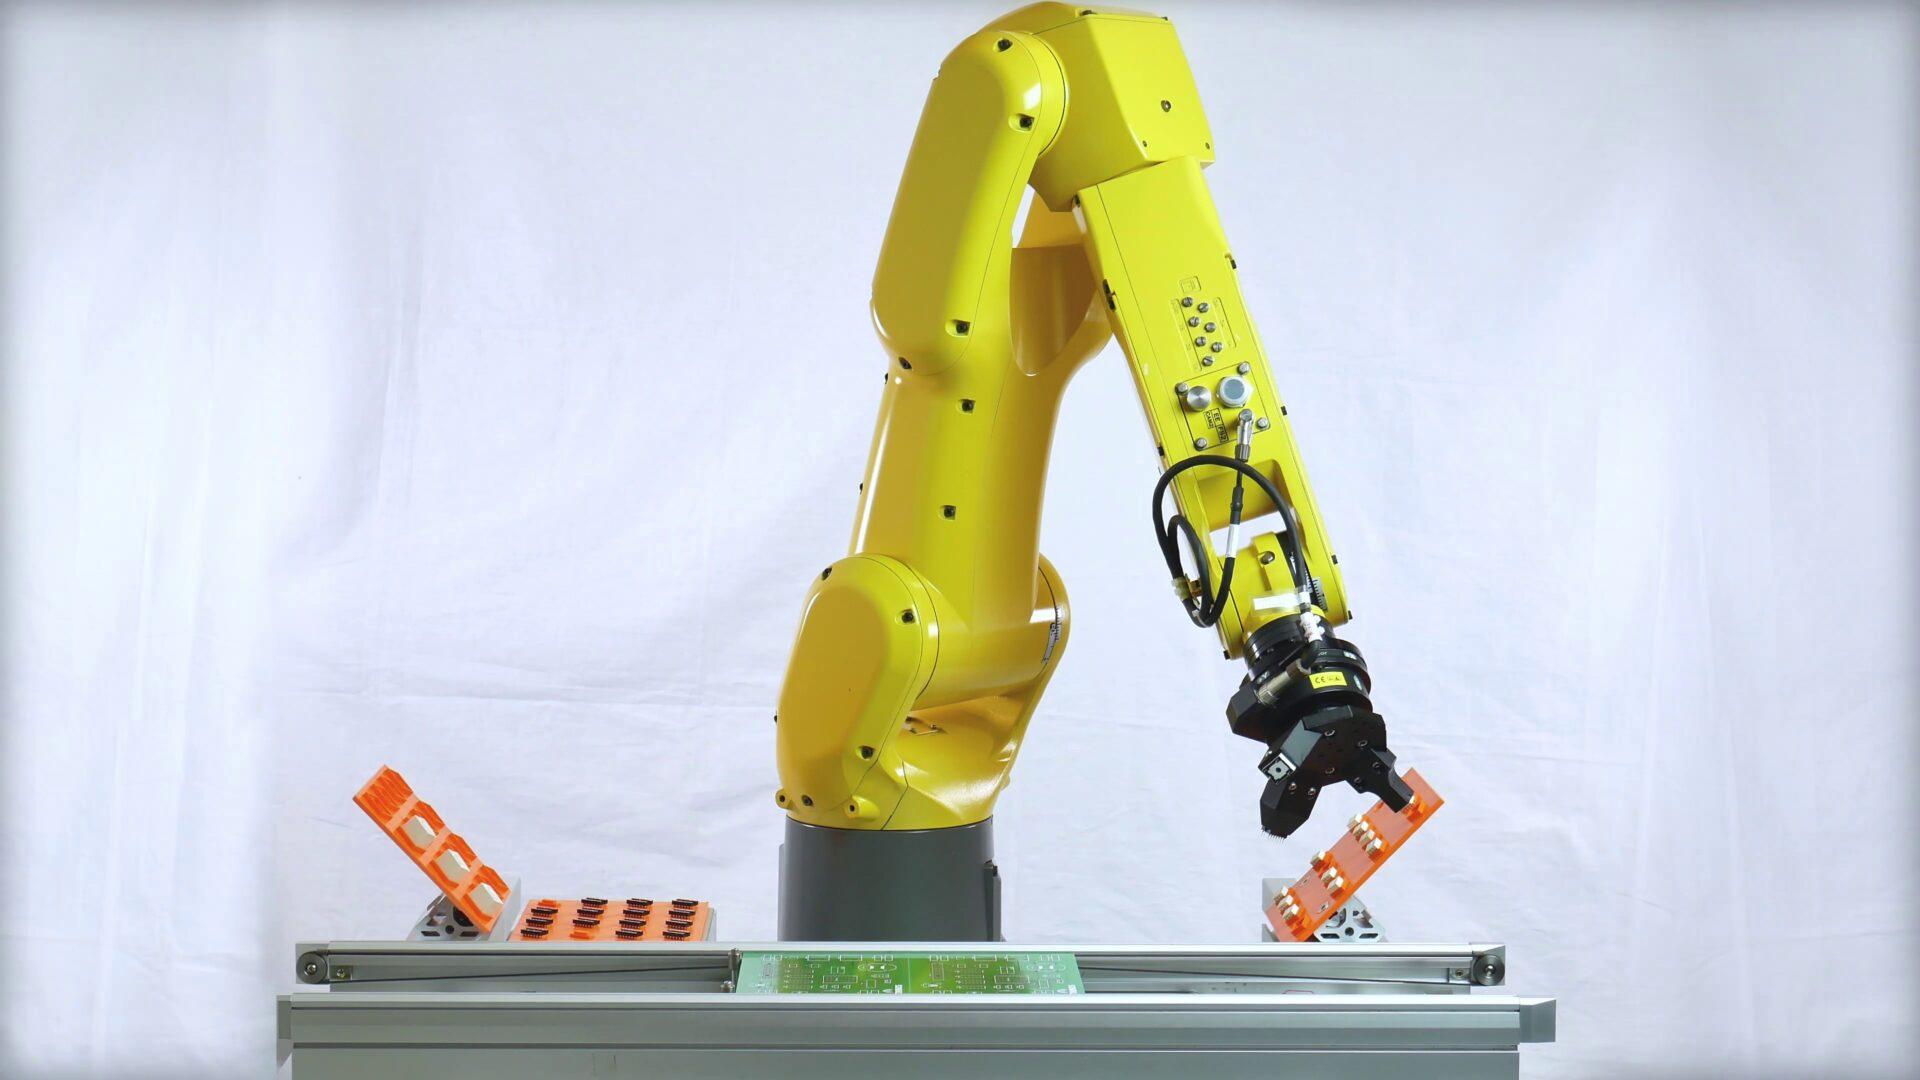 ArtiMinds Robotics - ArtiMinds RPS as an alternative to Fanuc simulation software Roboguide